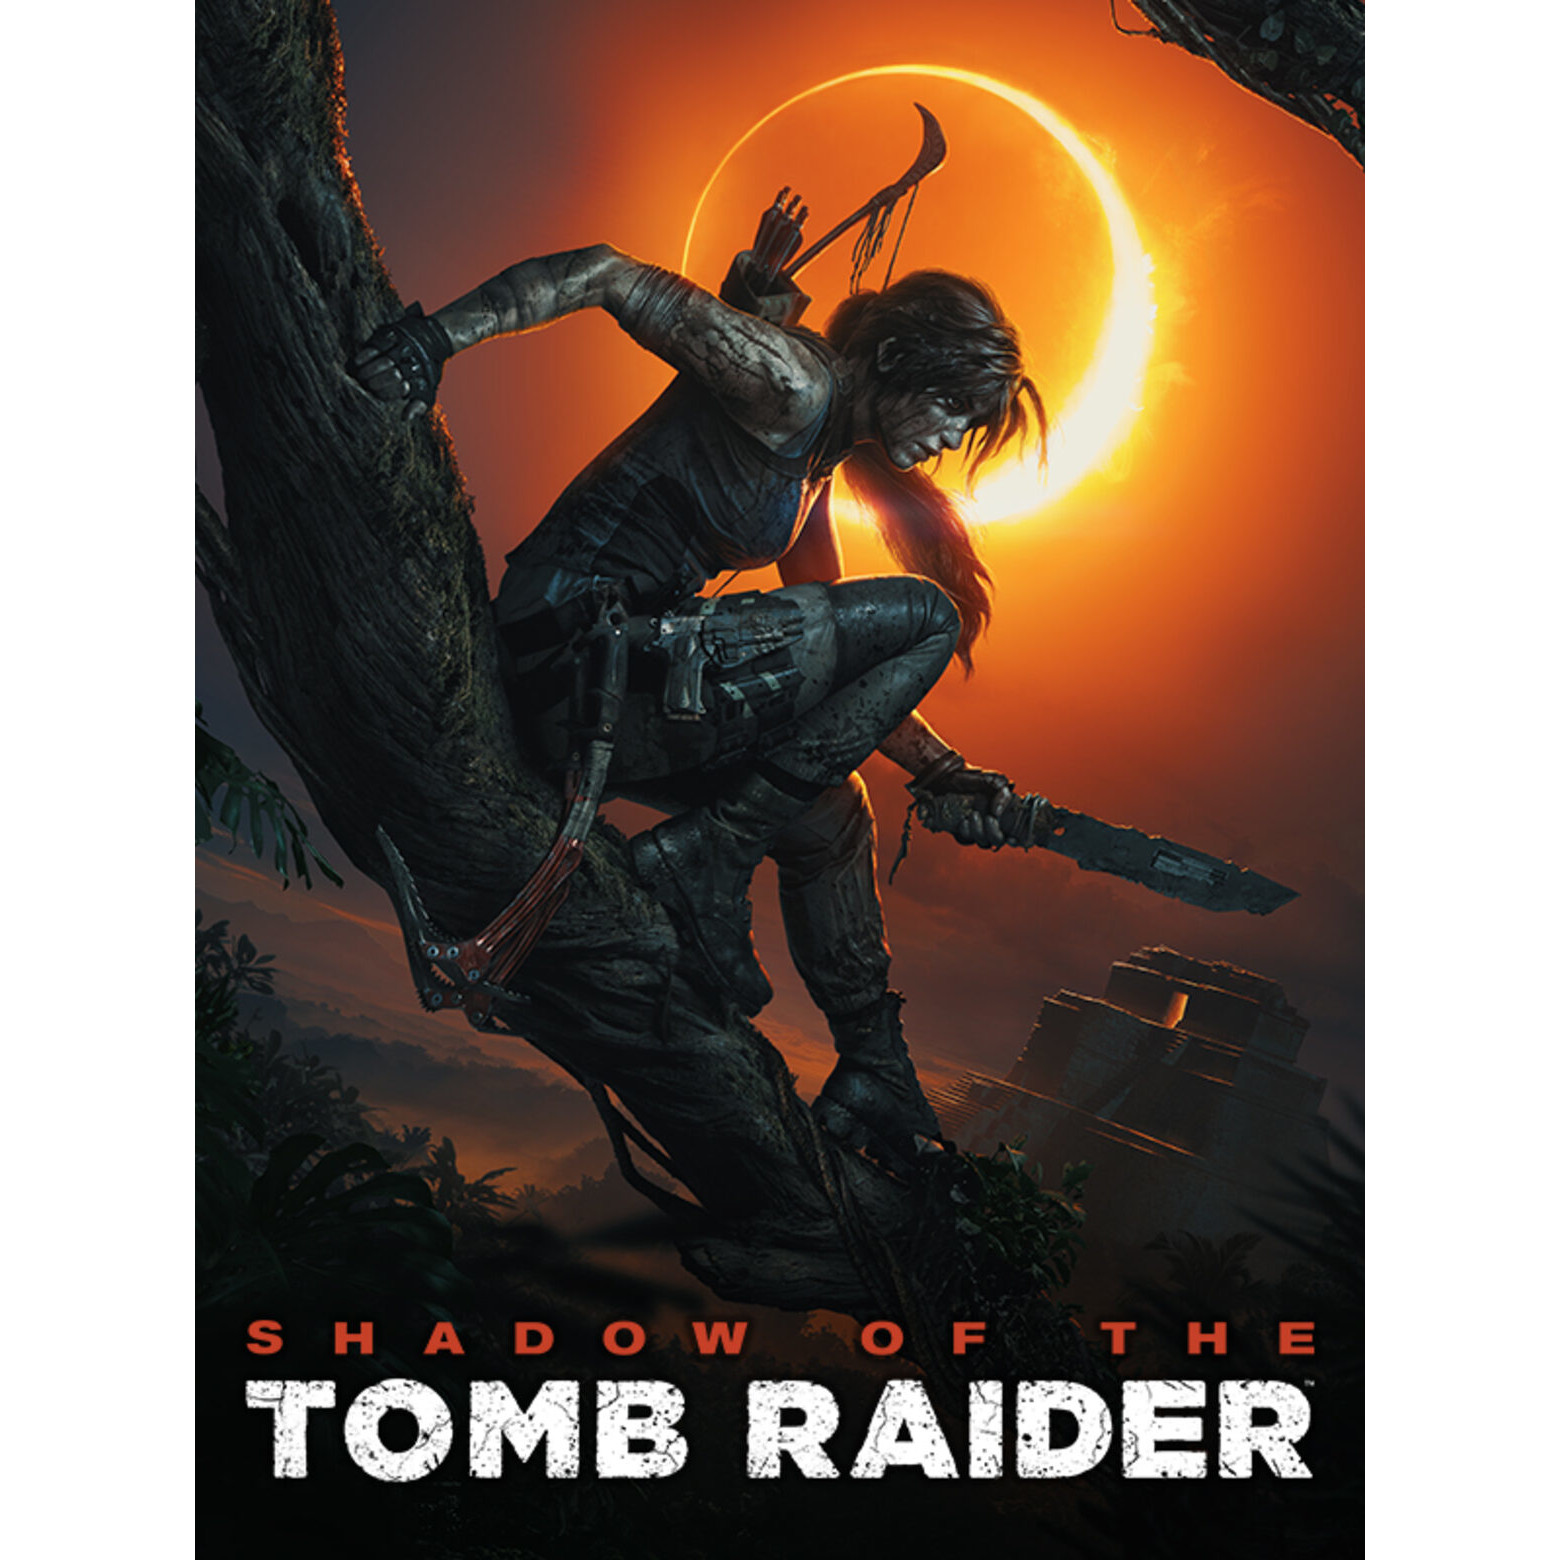 Joc Shadow of the Tomb Raider Steam Key Pentru Calculator 0